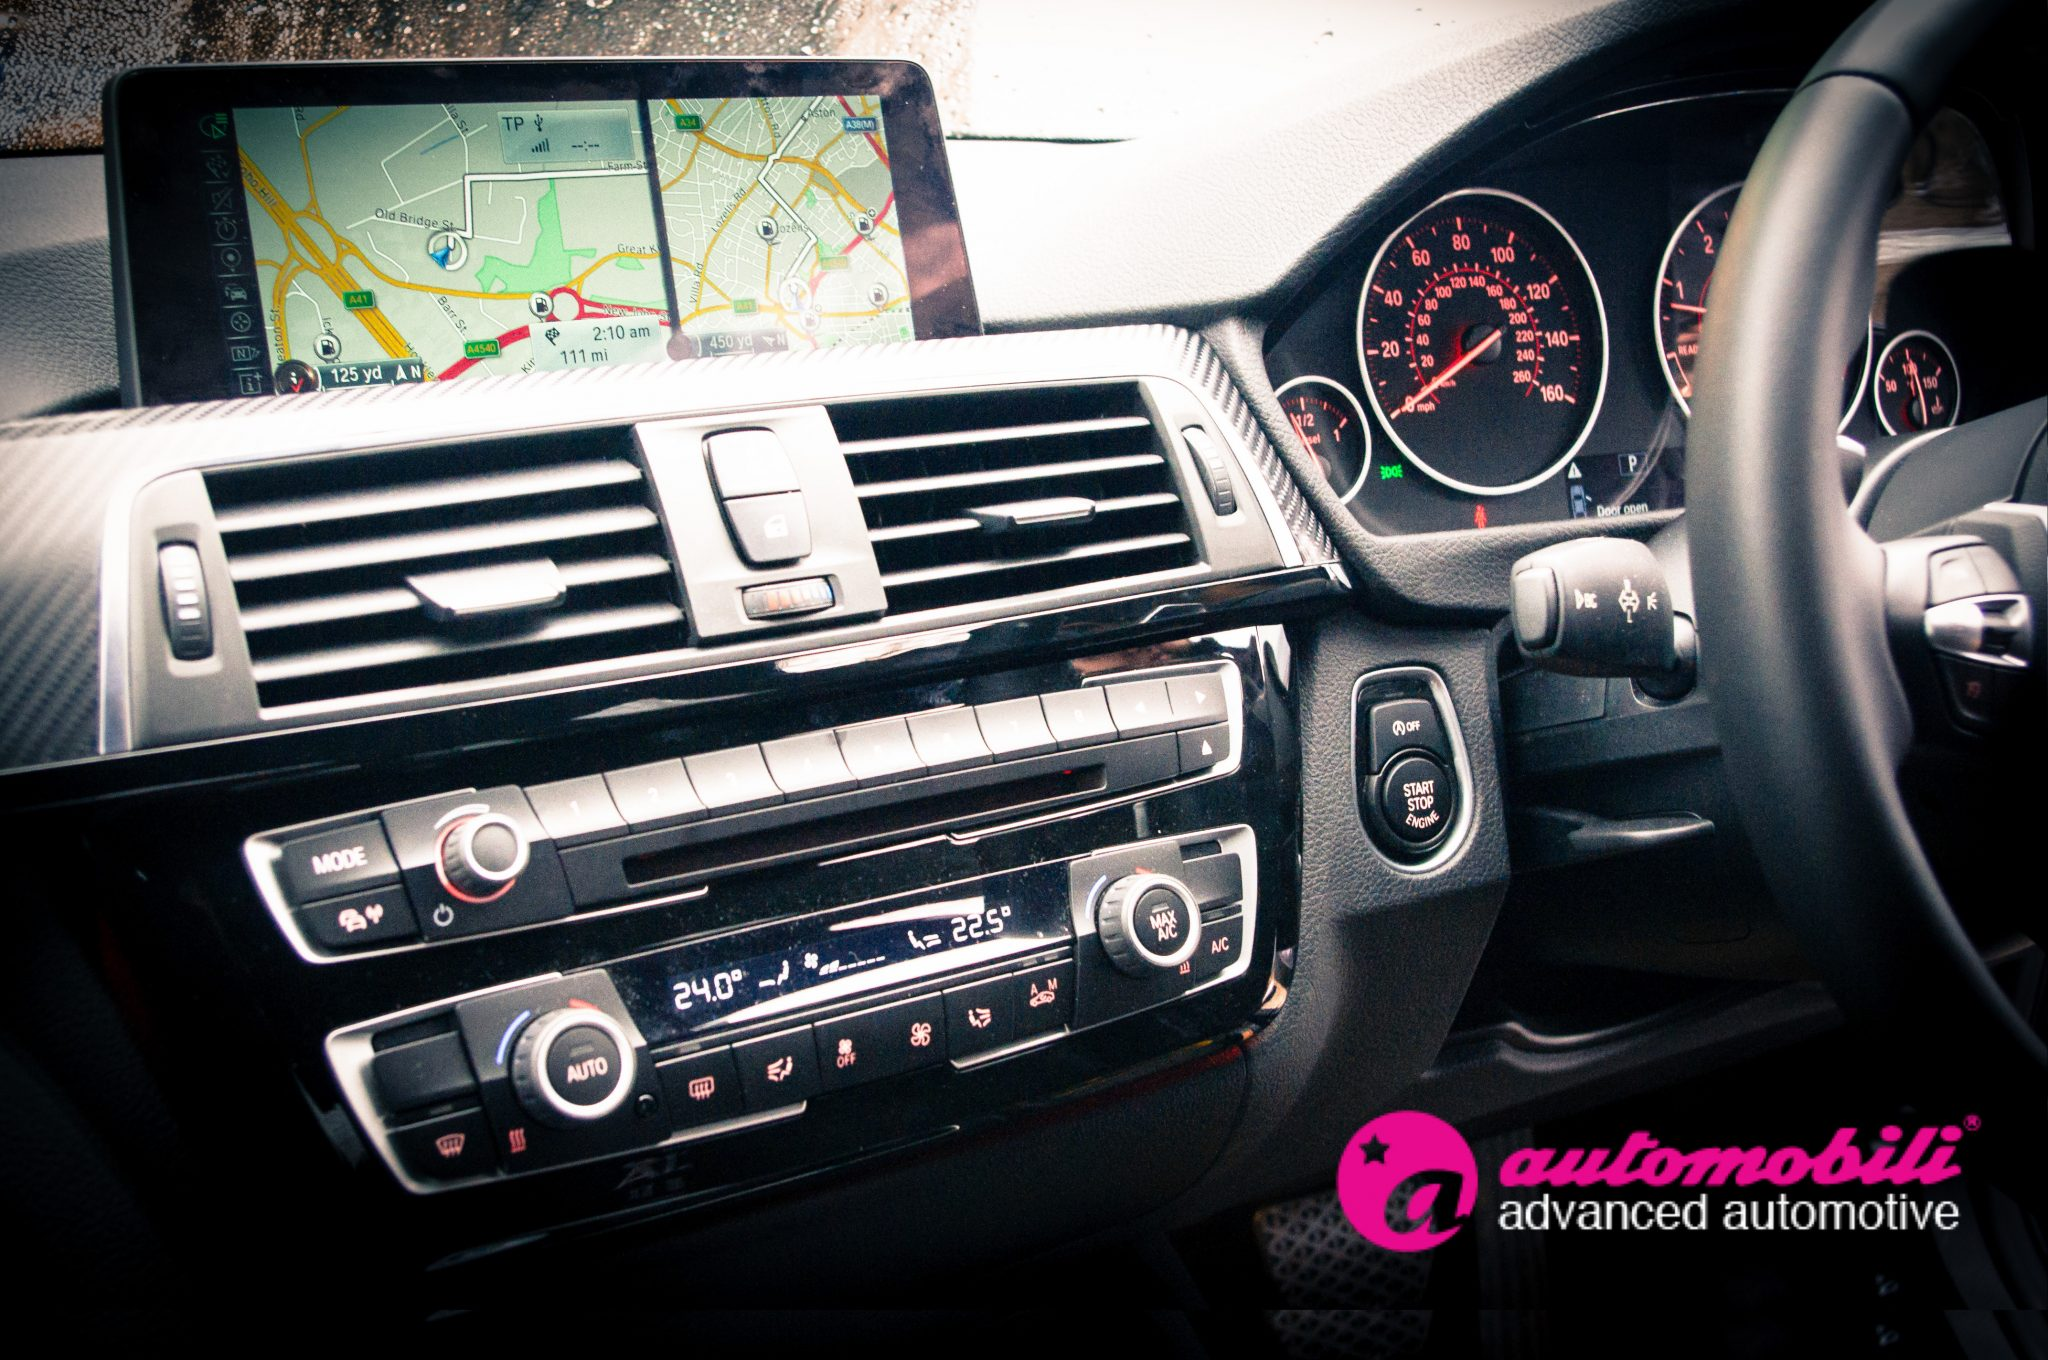 BMW-XDRIVE-F70-5446